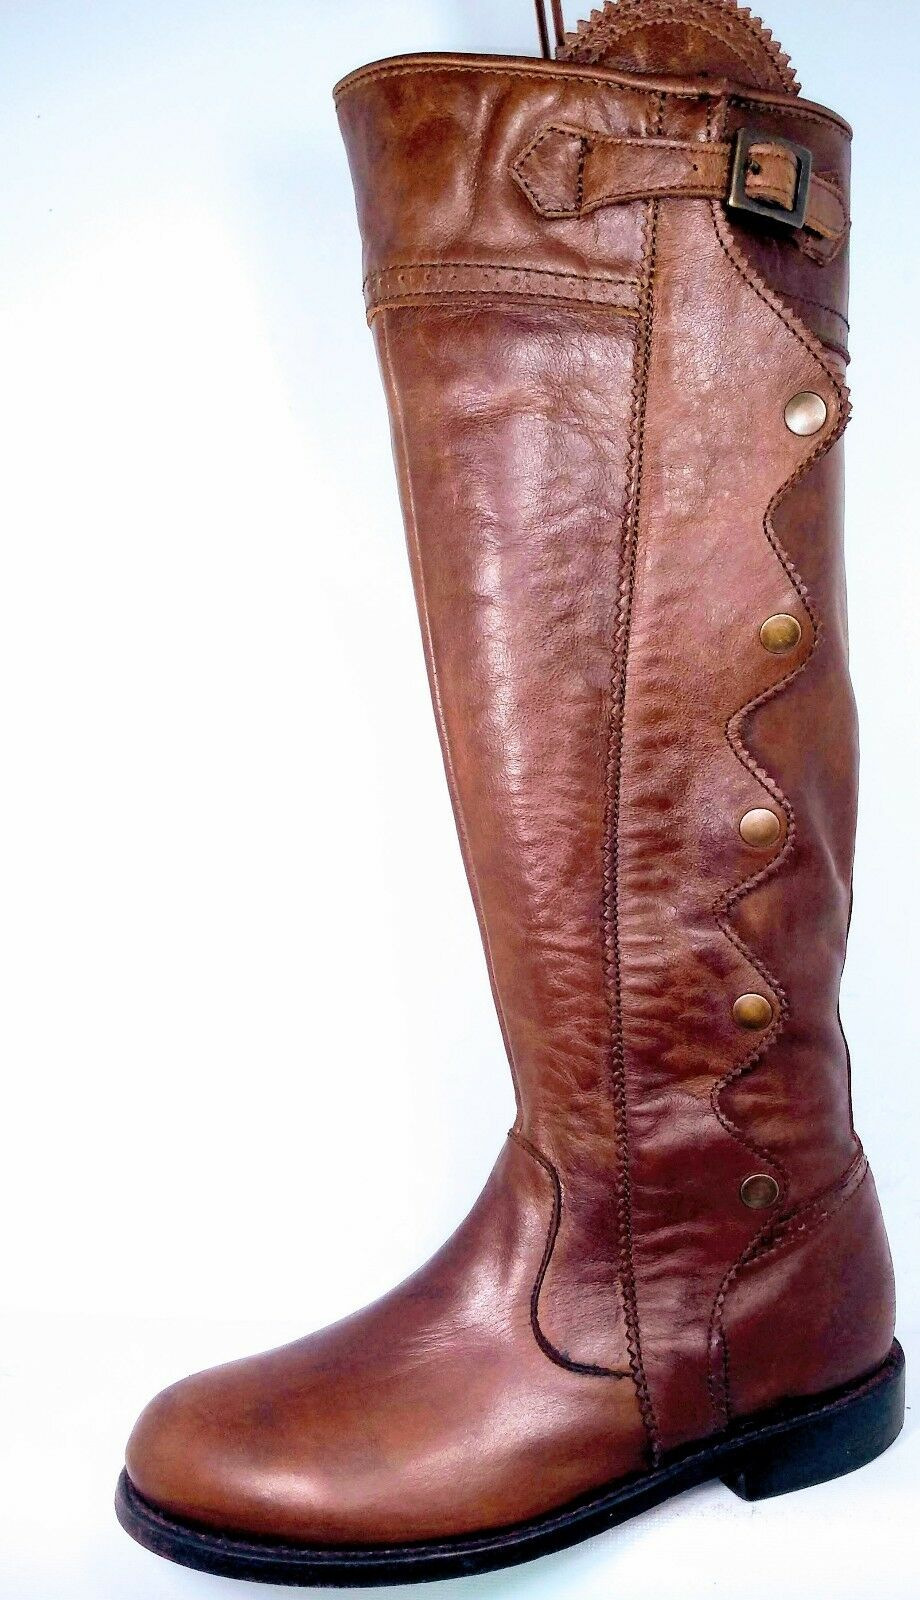 ANOUK Handmade Brown Pelle Riding Snaps Full Zip Stivali Donna   7 Minimal Wear